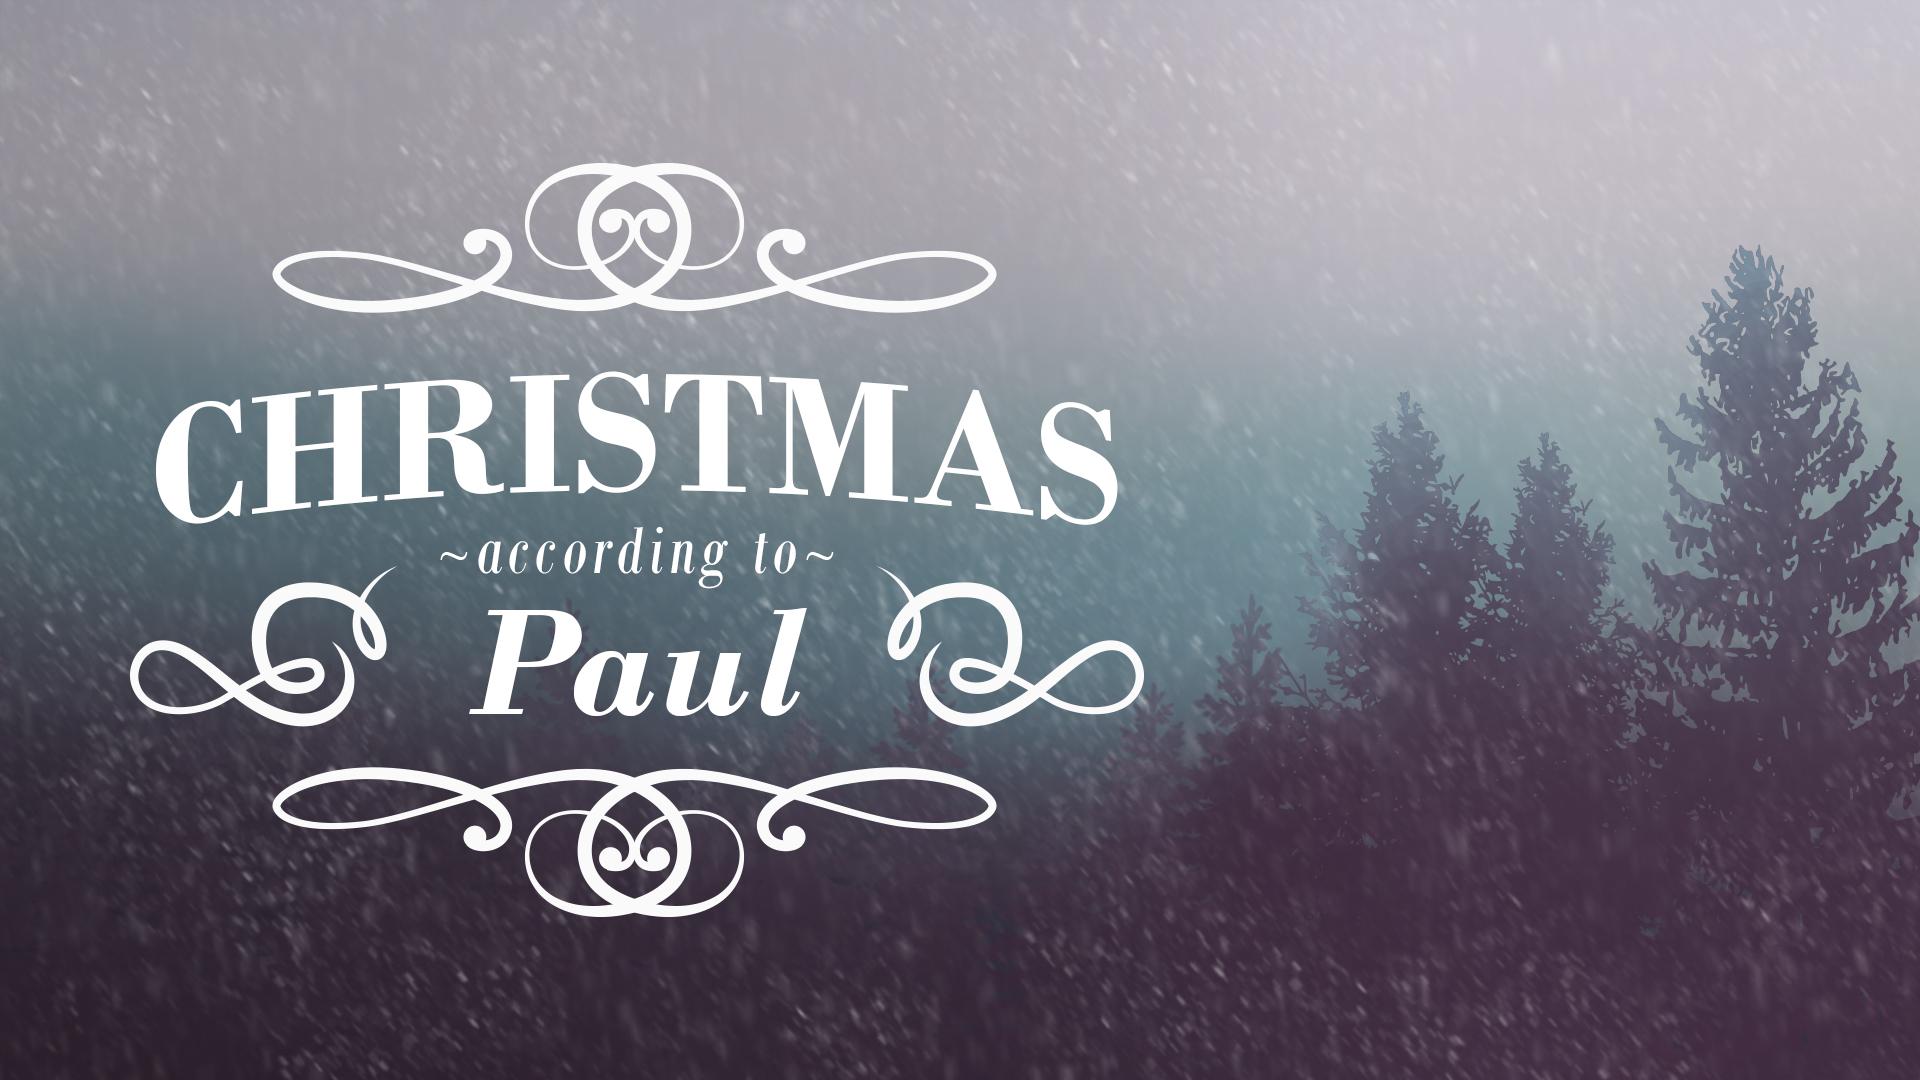 Christmas According to Paul